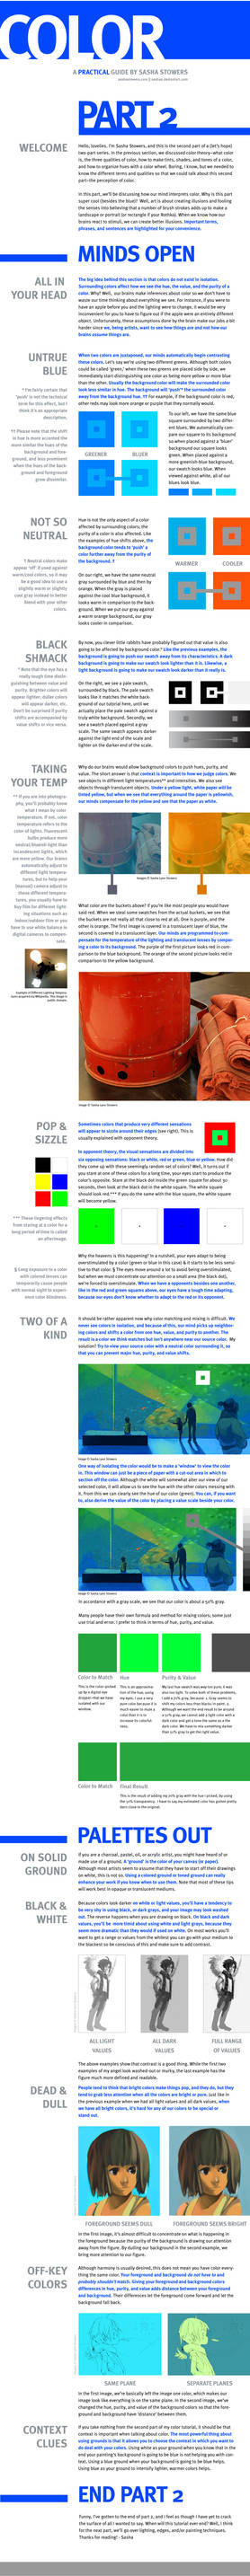 The Color Tutorial - Part 2